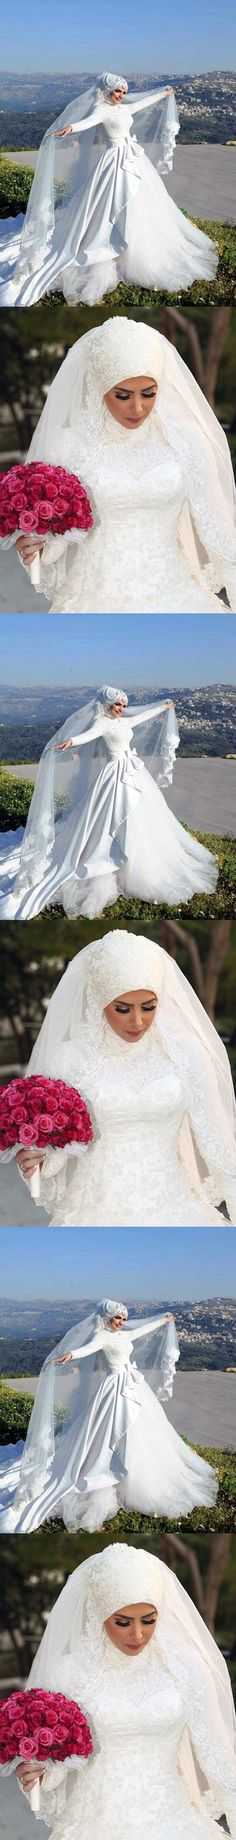 + ideas about Mariage Musulman on Pinterest  Muslim Dress, Alliance ...